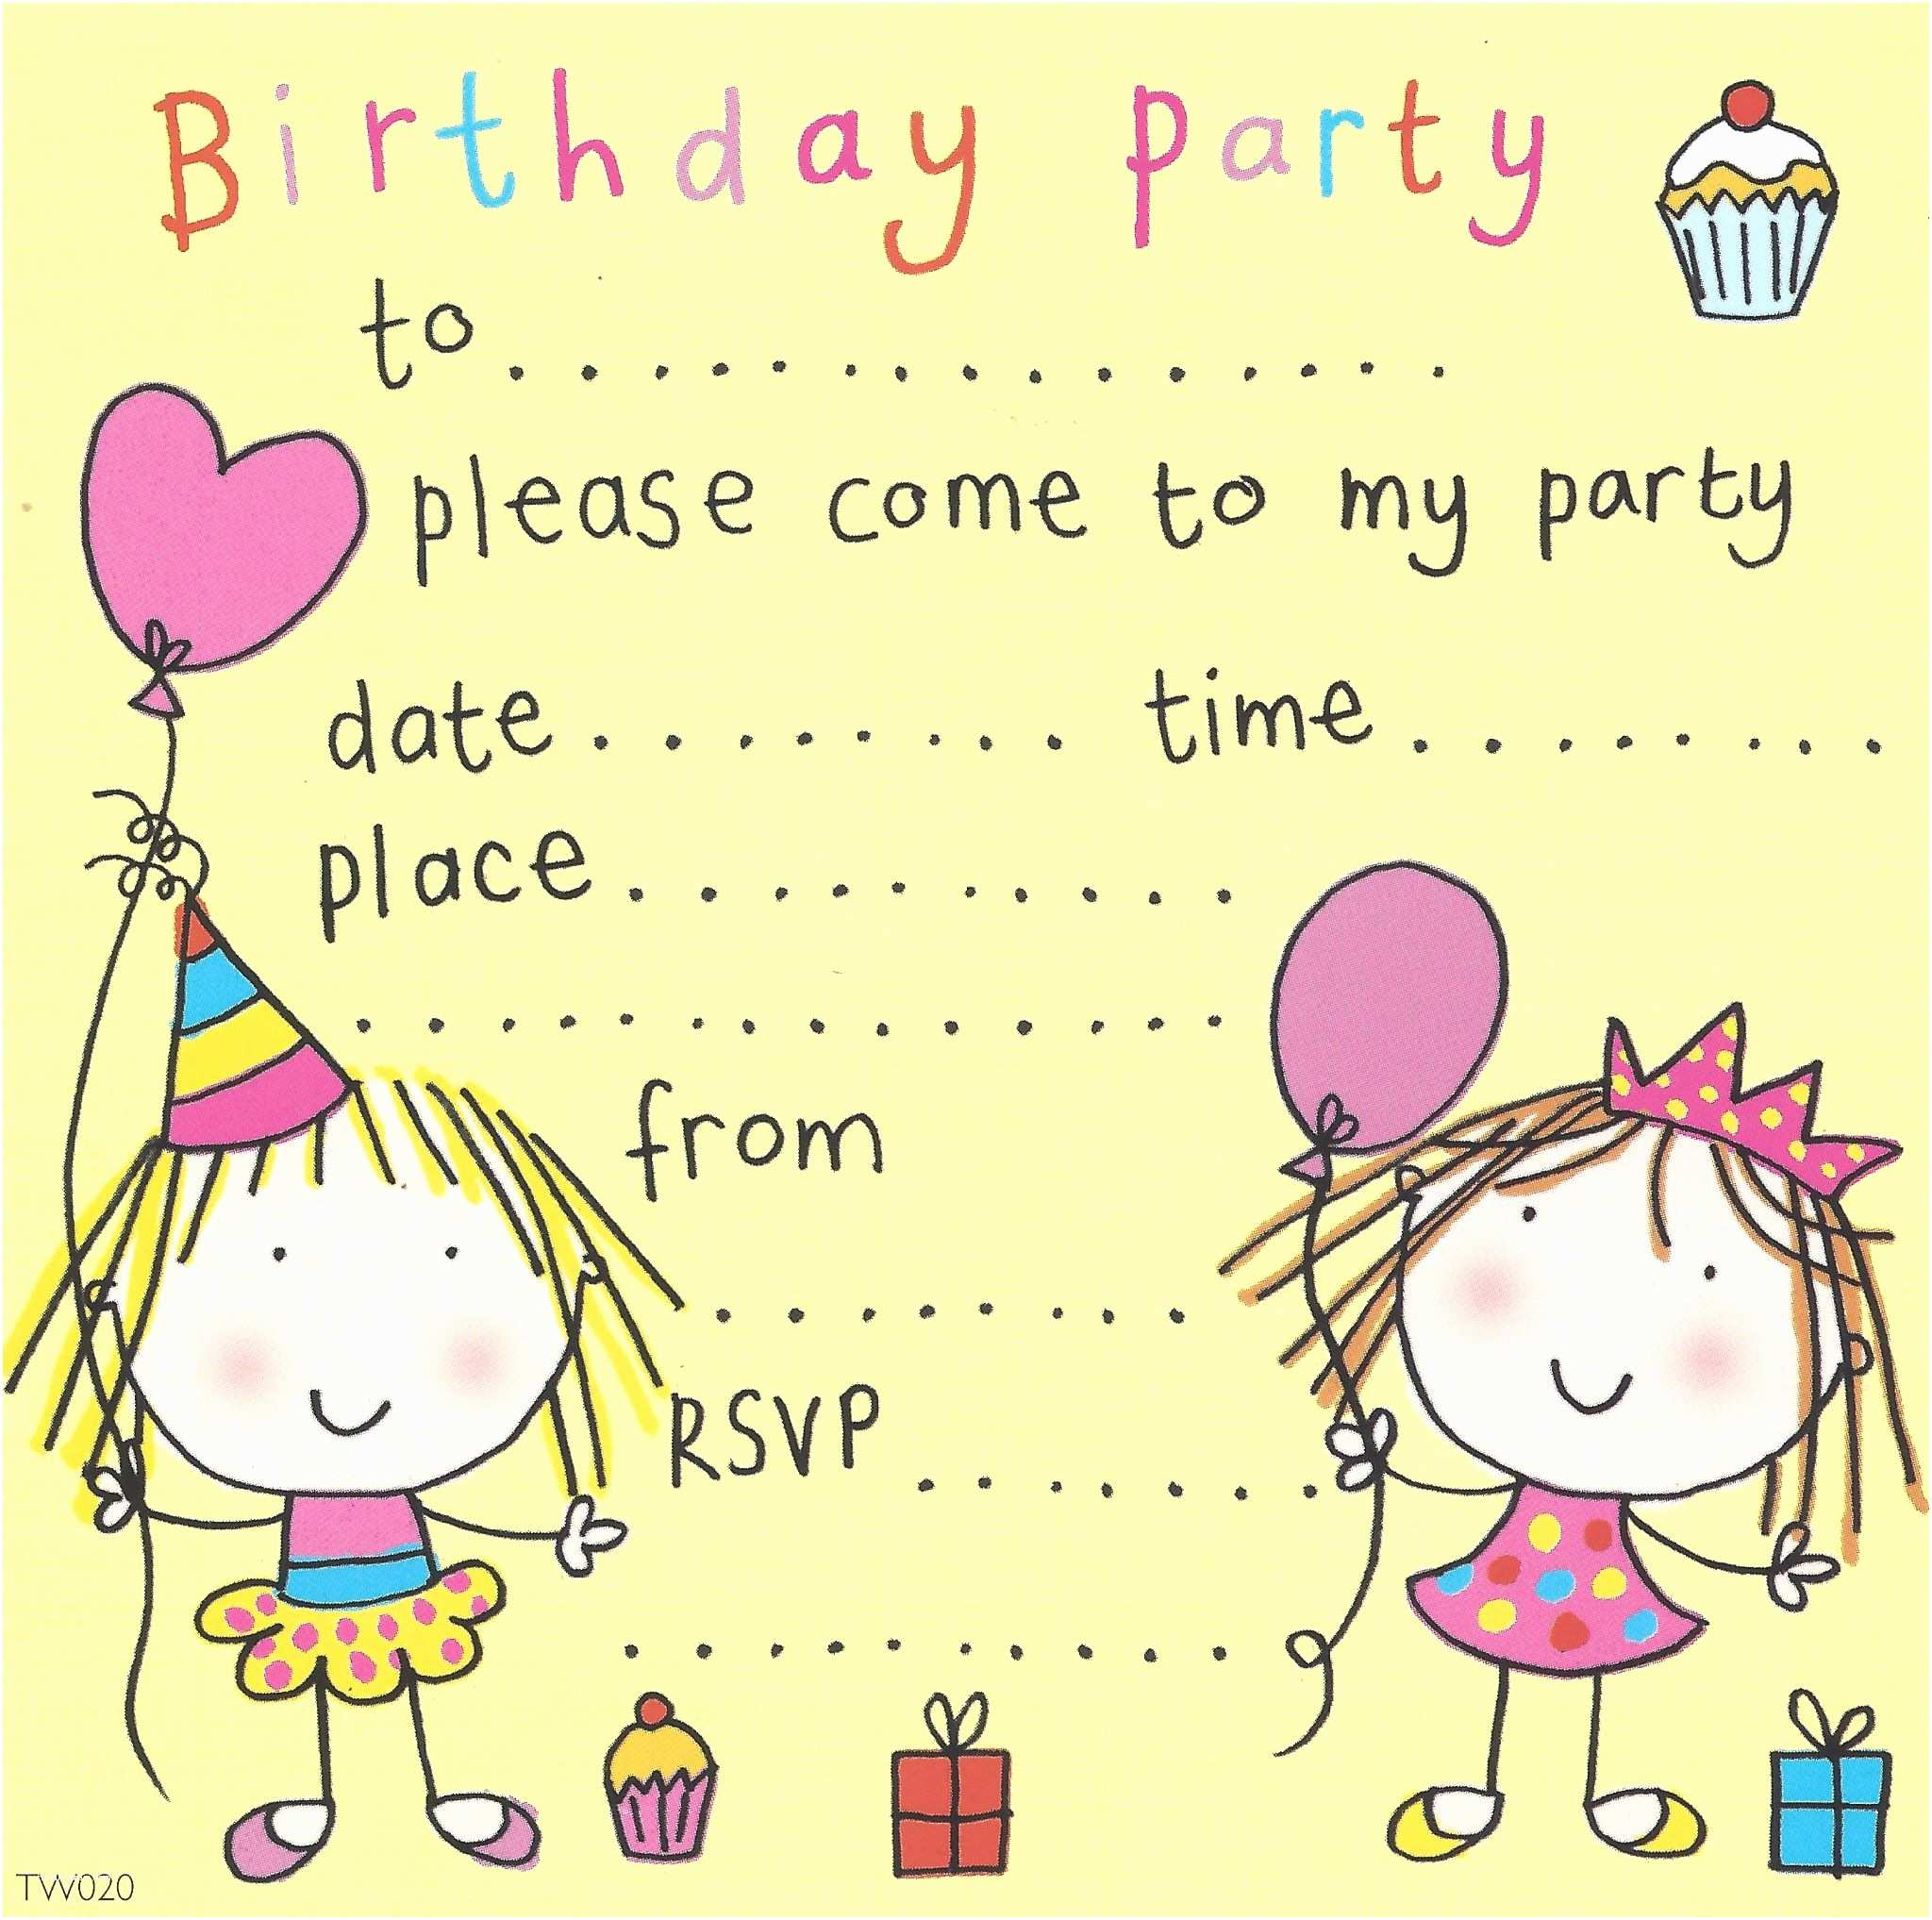 Girl Birthday Party Invitations Party Invitations Birthday Party Invitations Kids Party